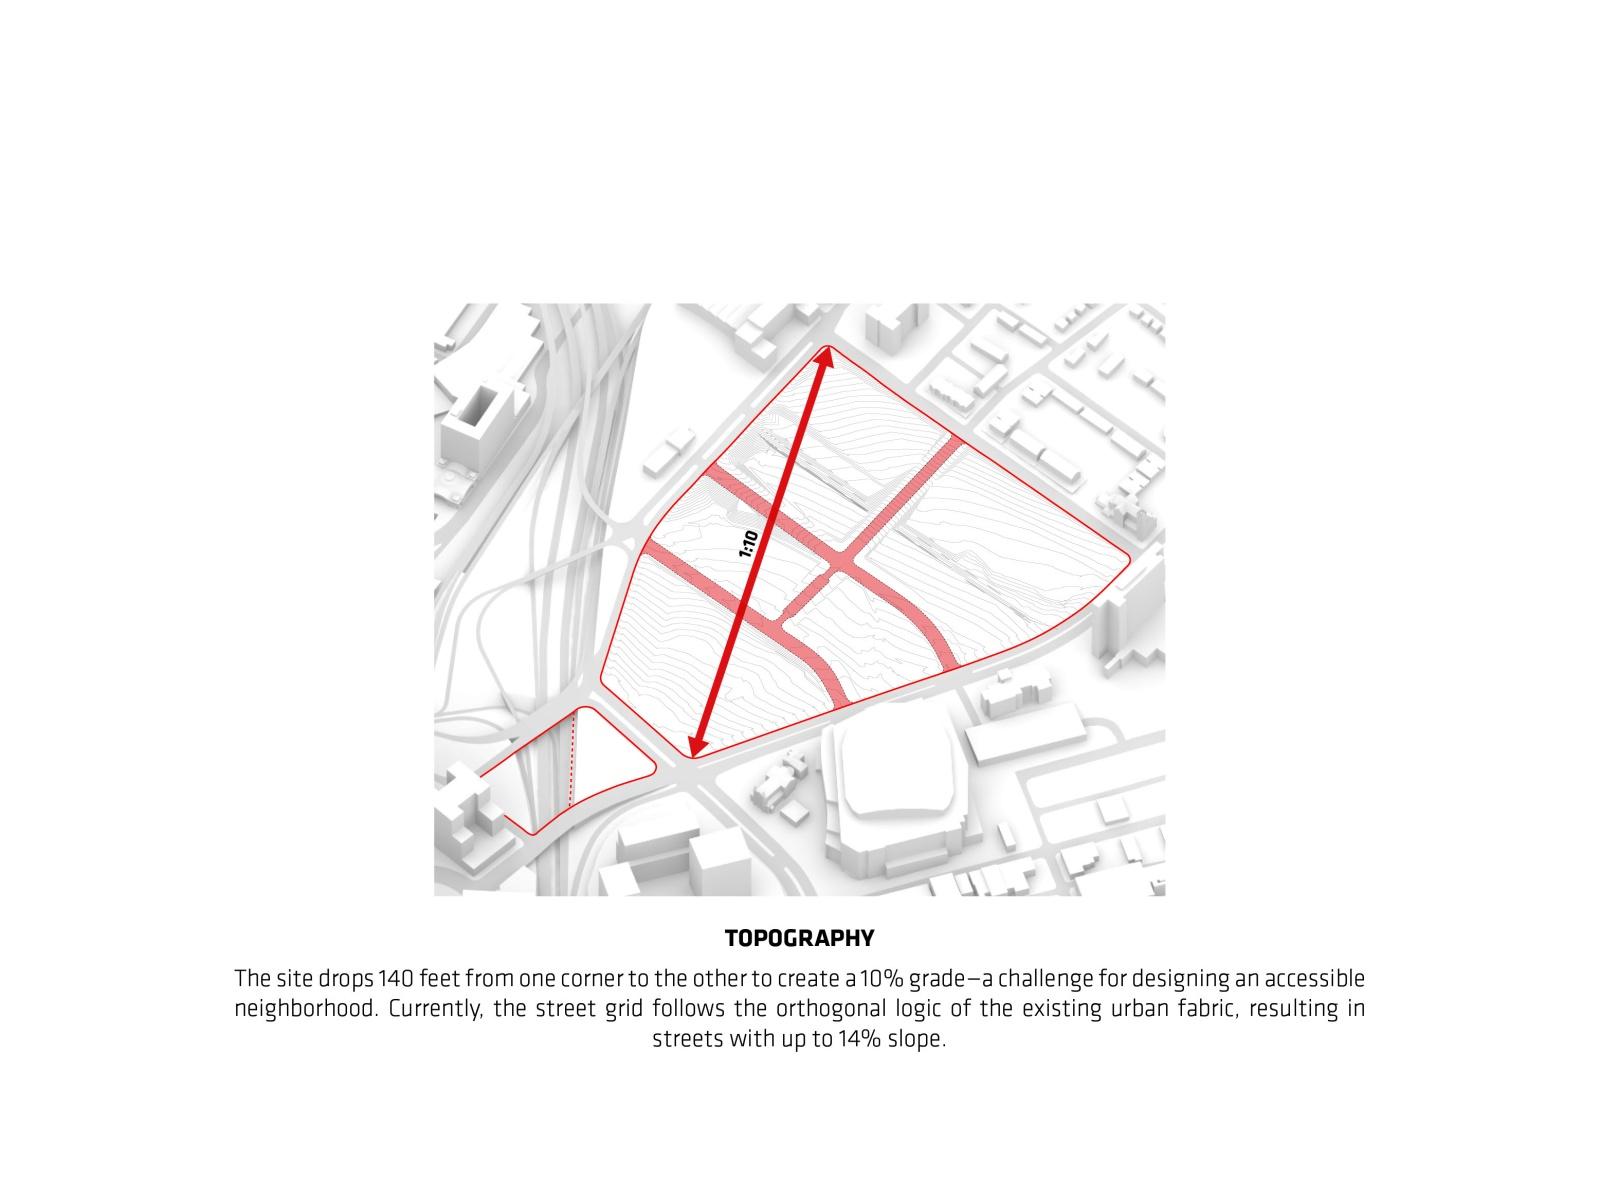 Pittsburgh Lower Hill Master Plan By Bjarke Ingels Group